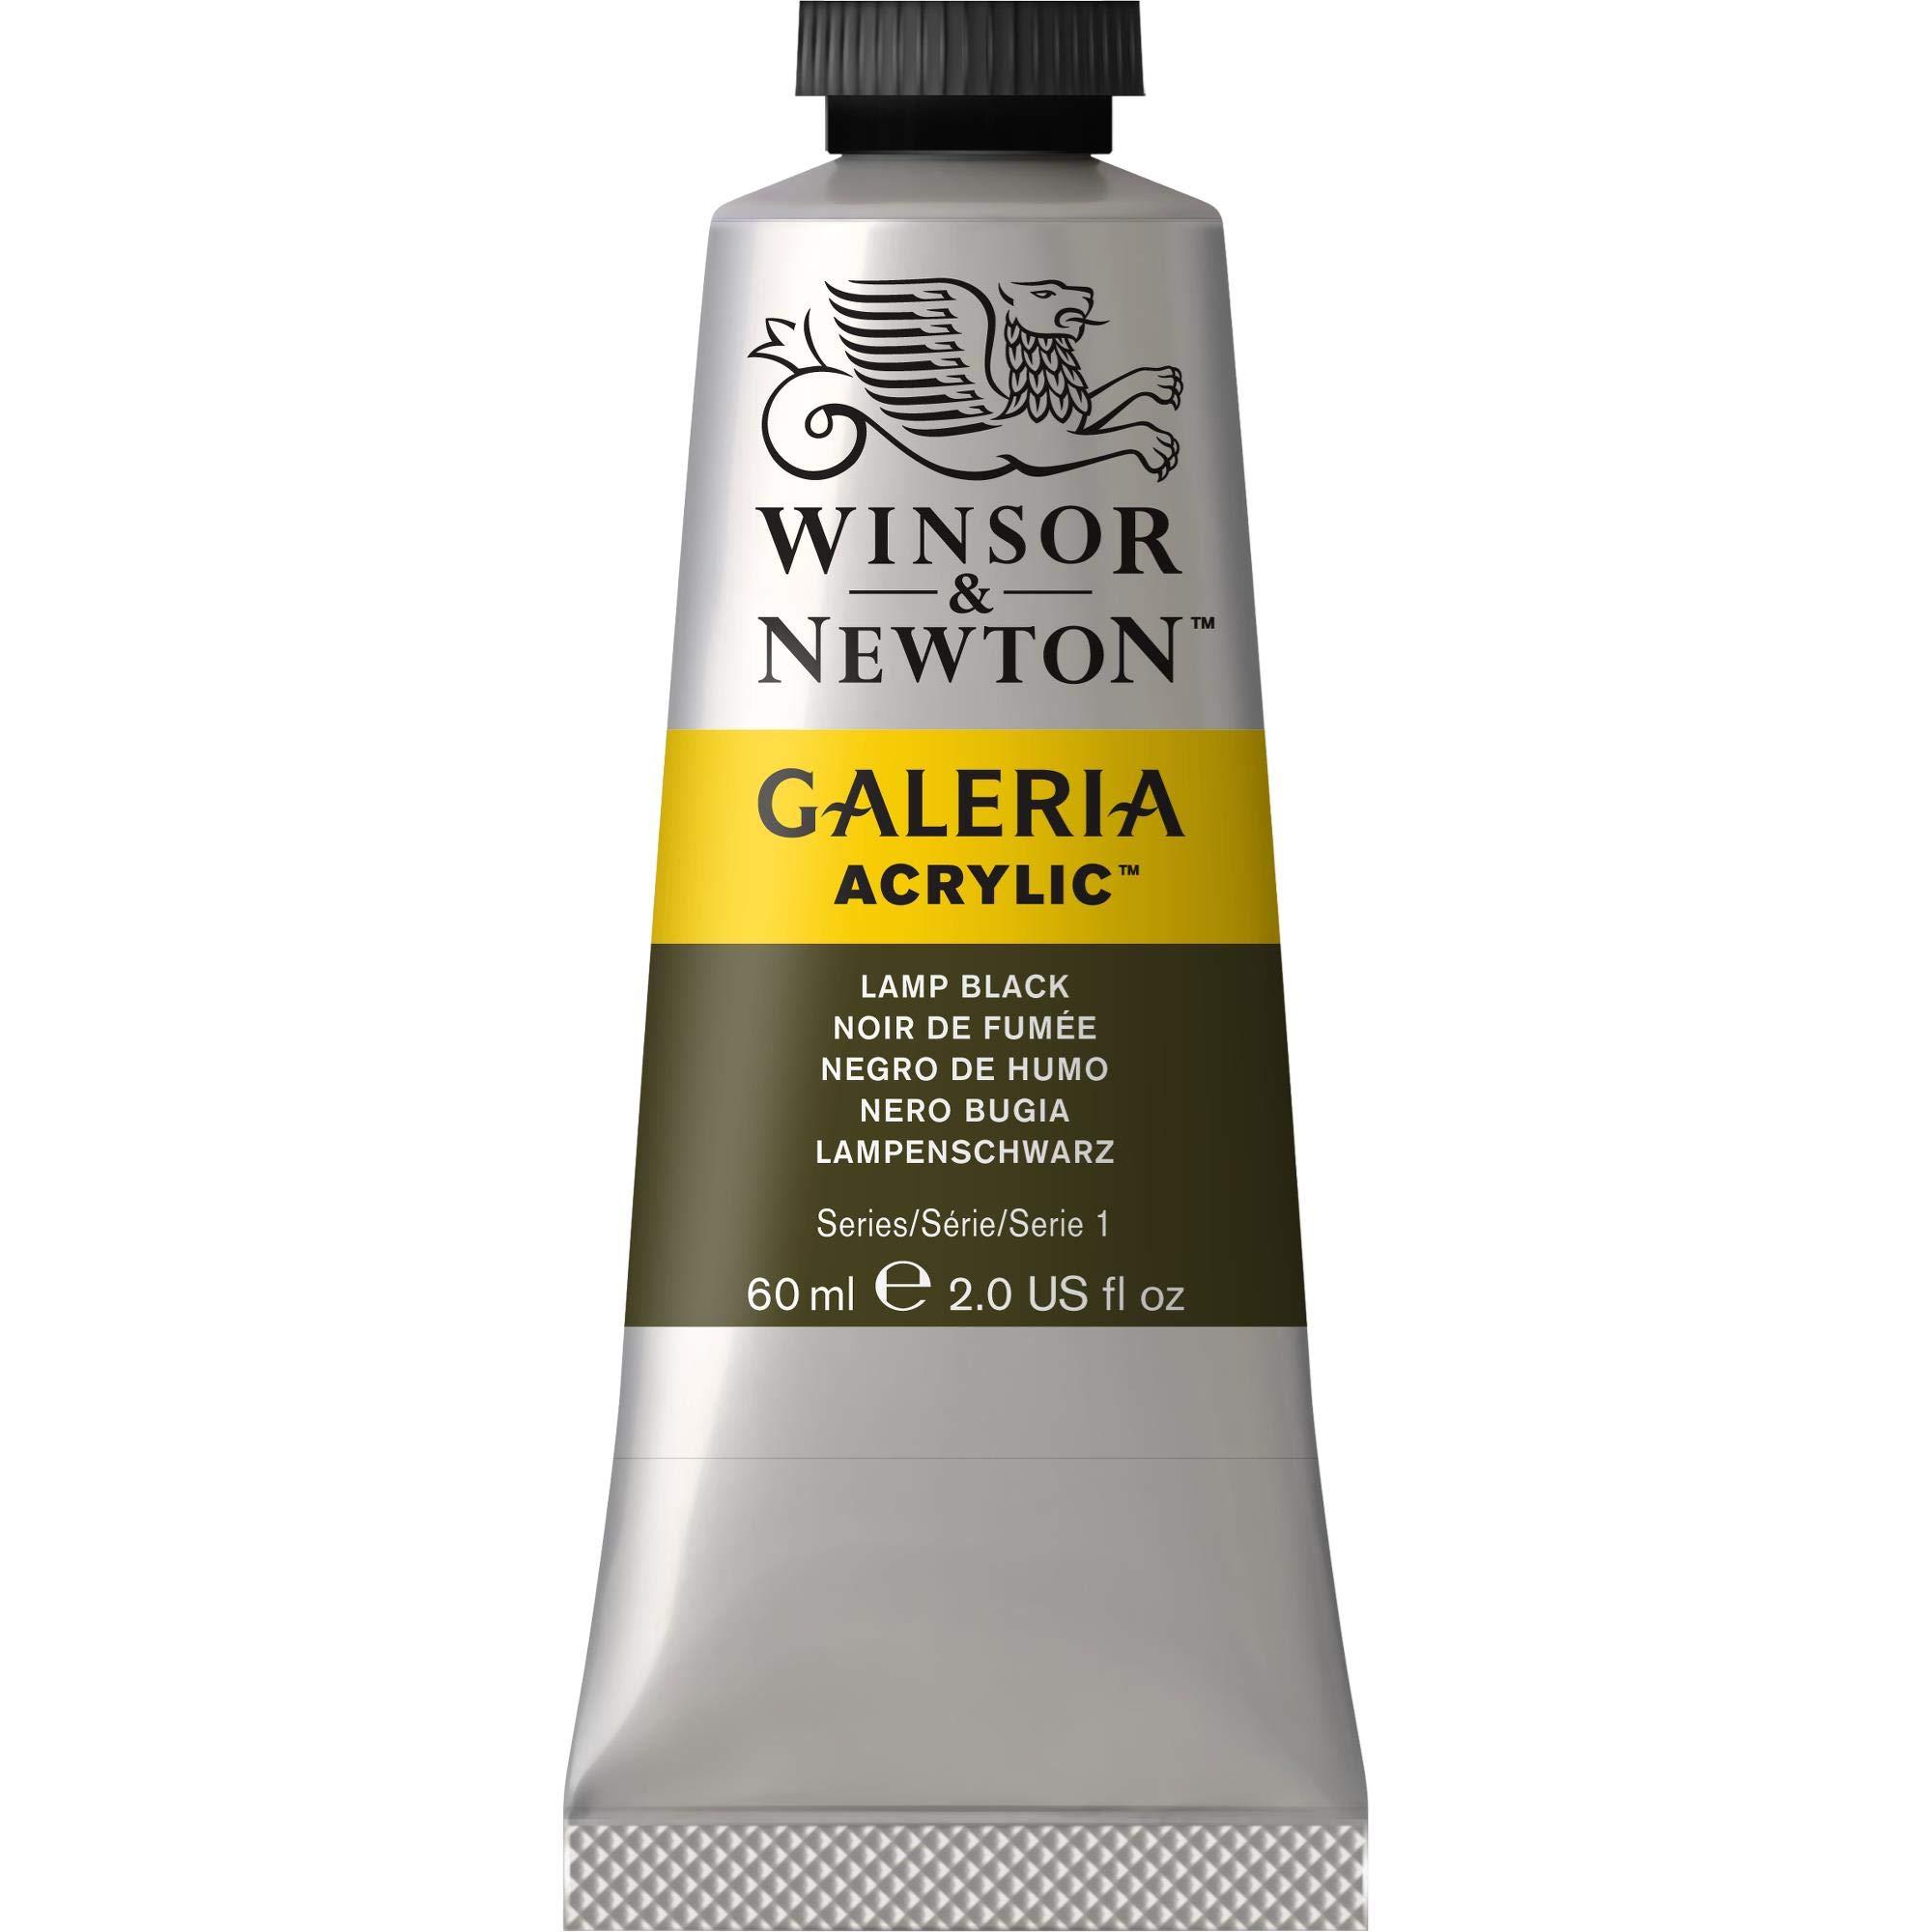 Winsor & Newton Galeria Acrylic Paint, 60ml Tube, Lamp Black